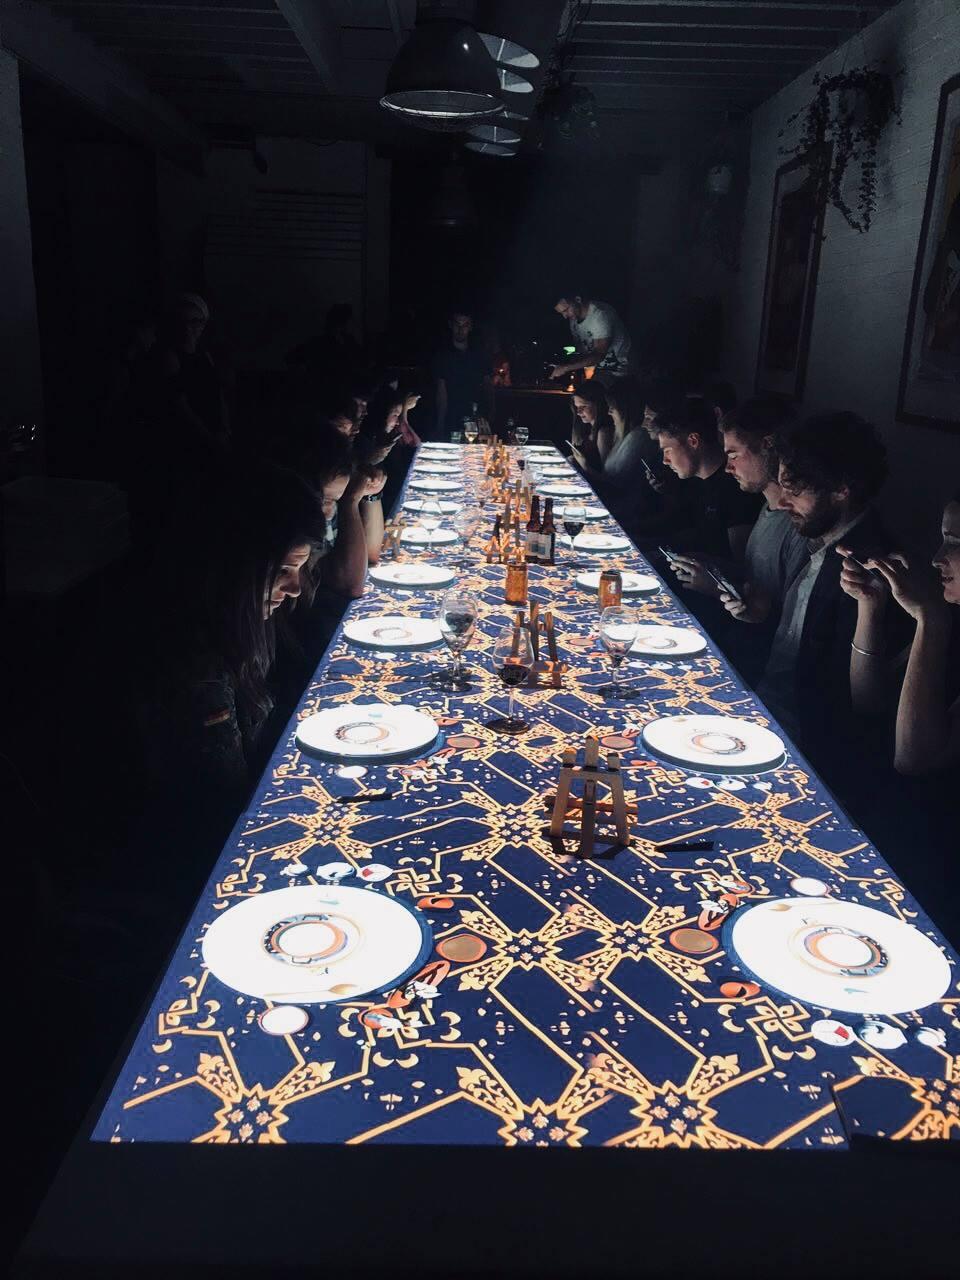 dining-experiences-london-le-petit-chef-shoreditch